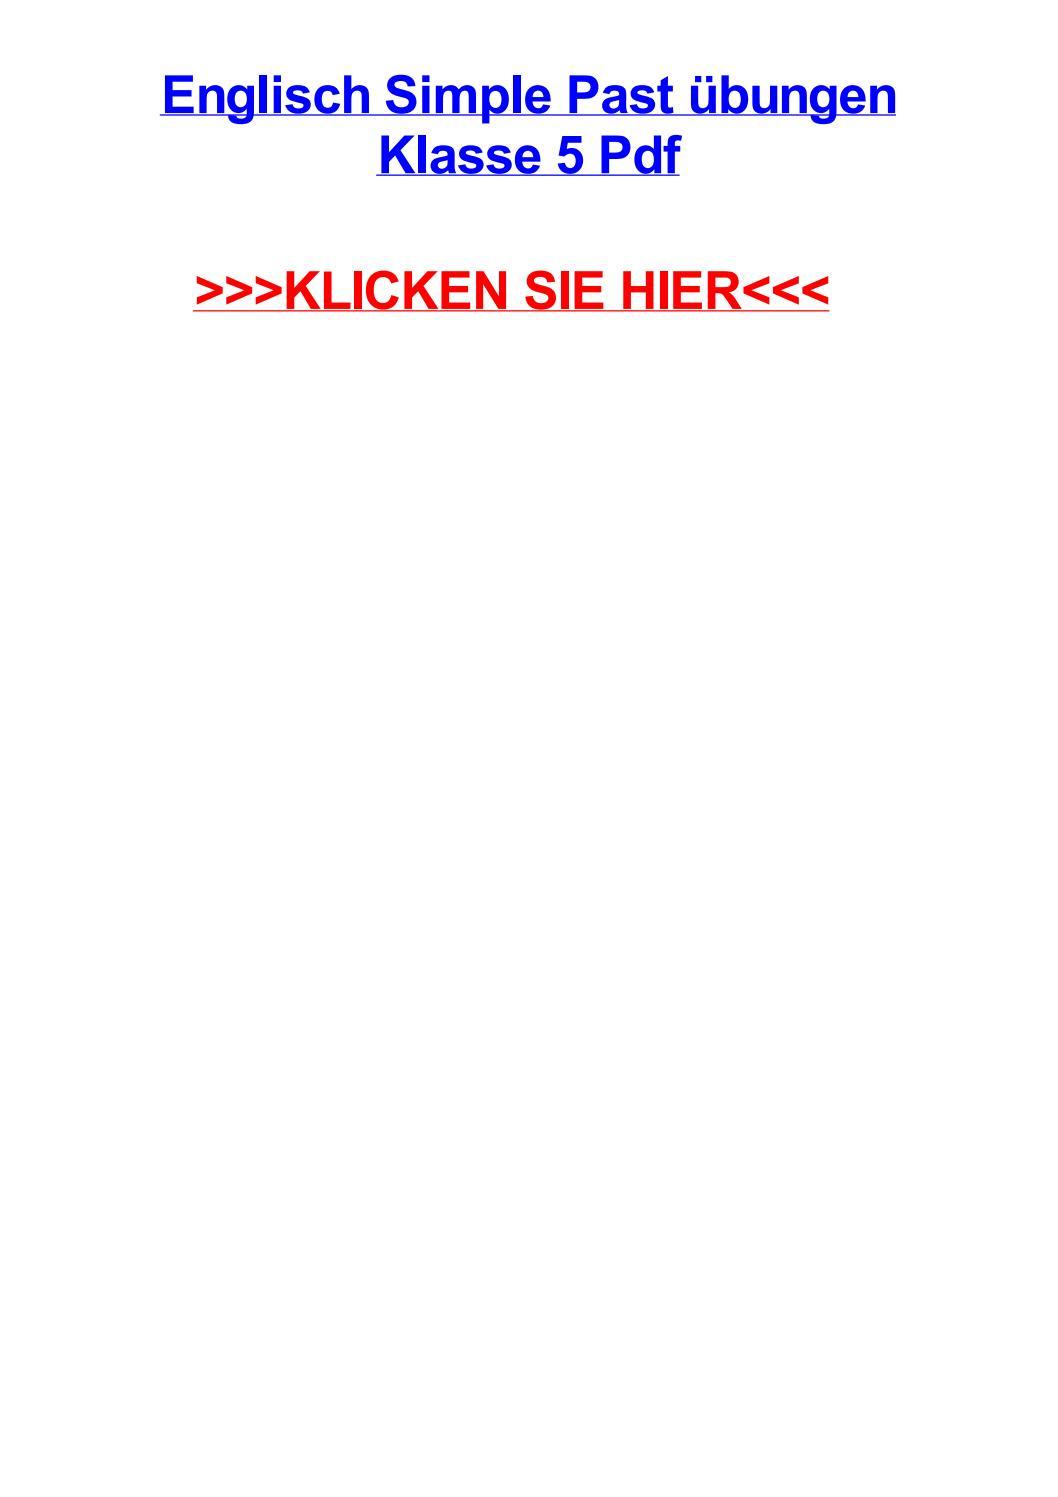 Englisch simple past jbungen klasse 5 pdf by jamescfuu - issuu